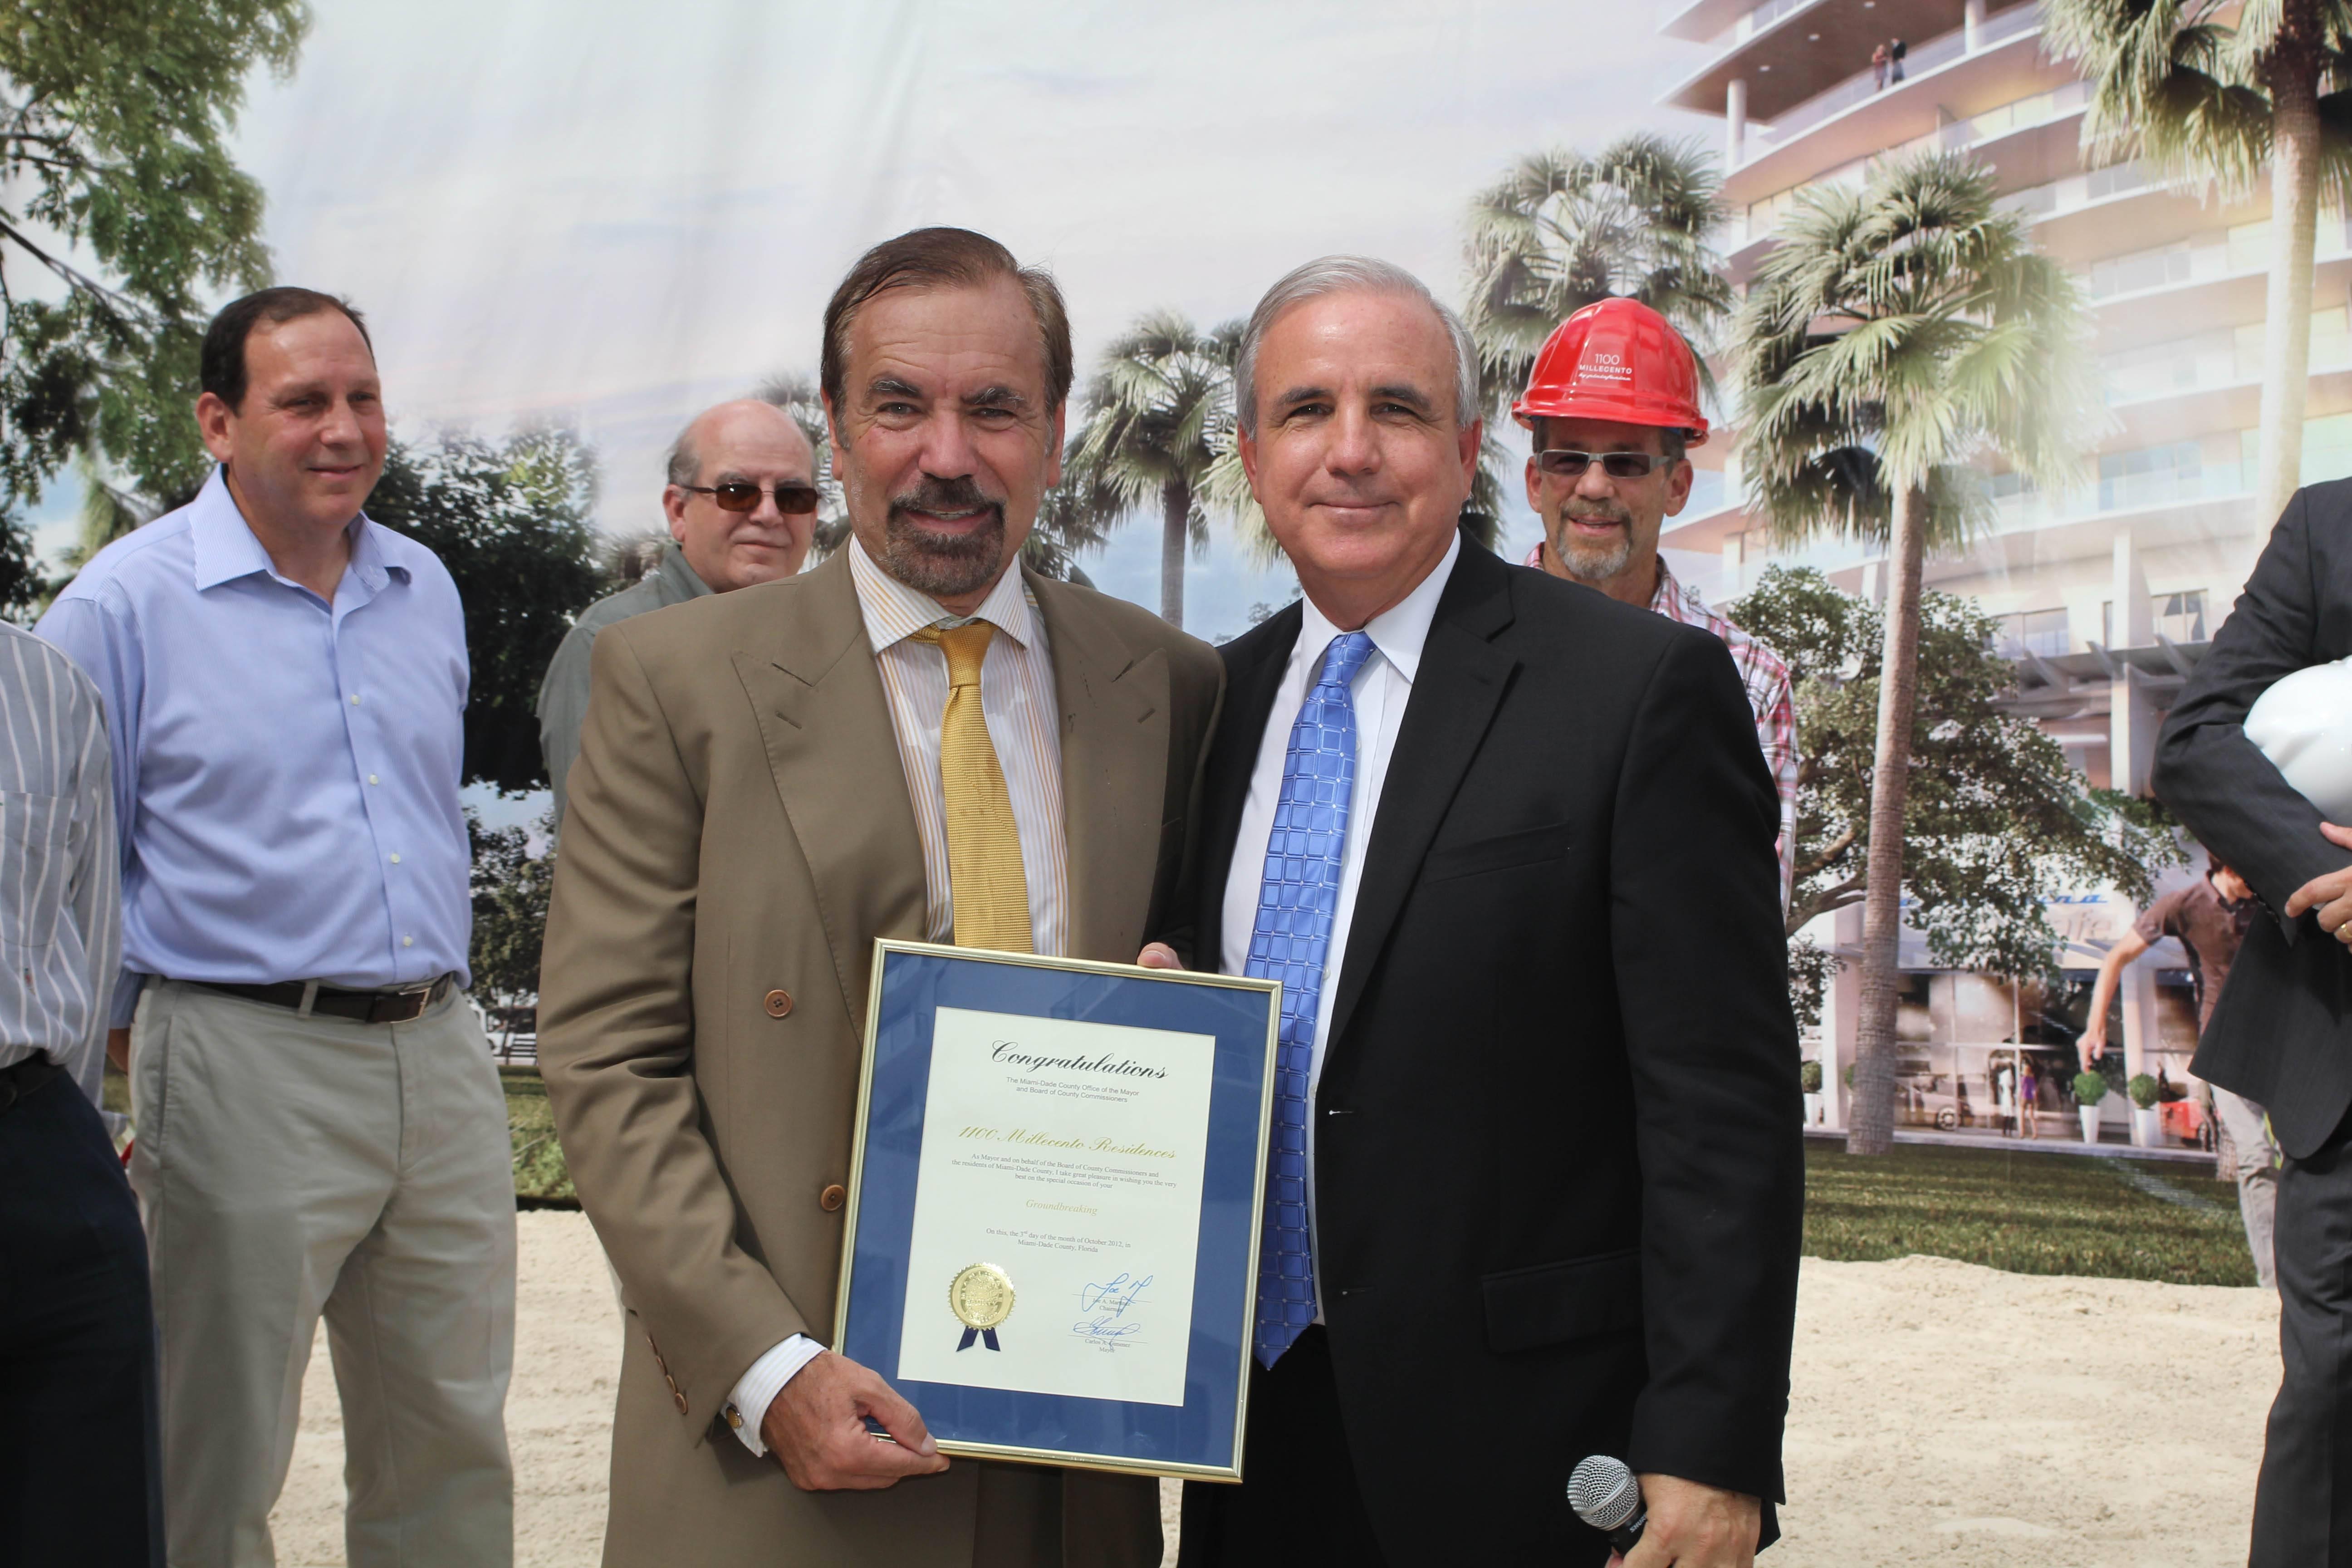 Jorge Perez, Mayor Gimenez